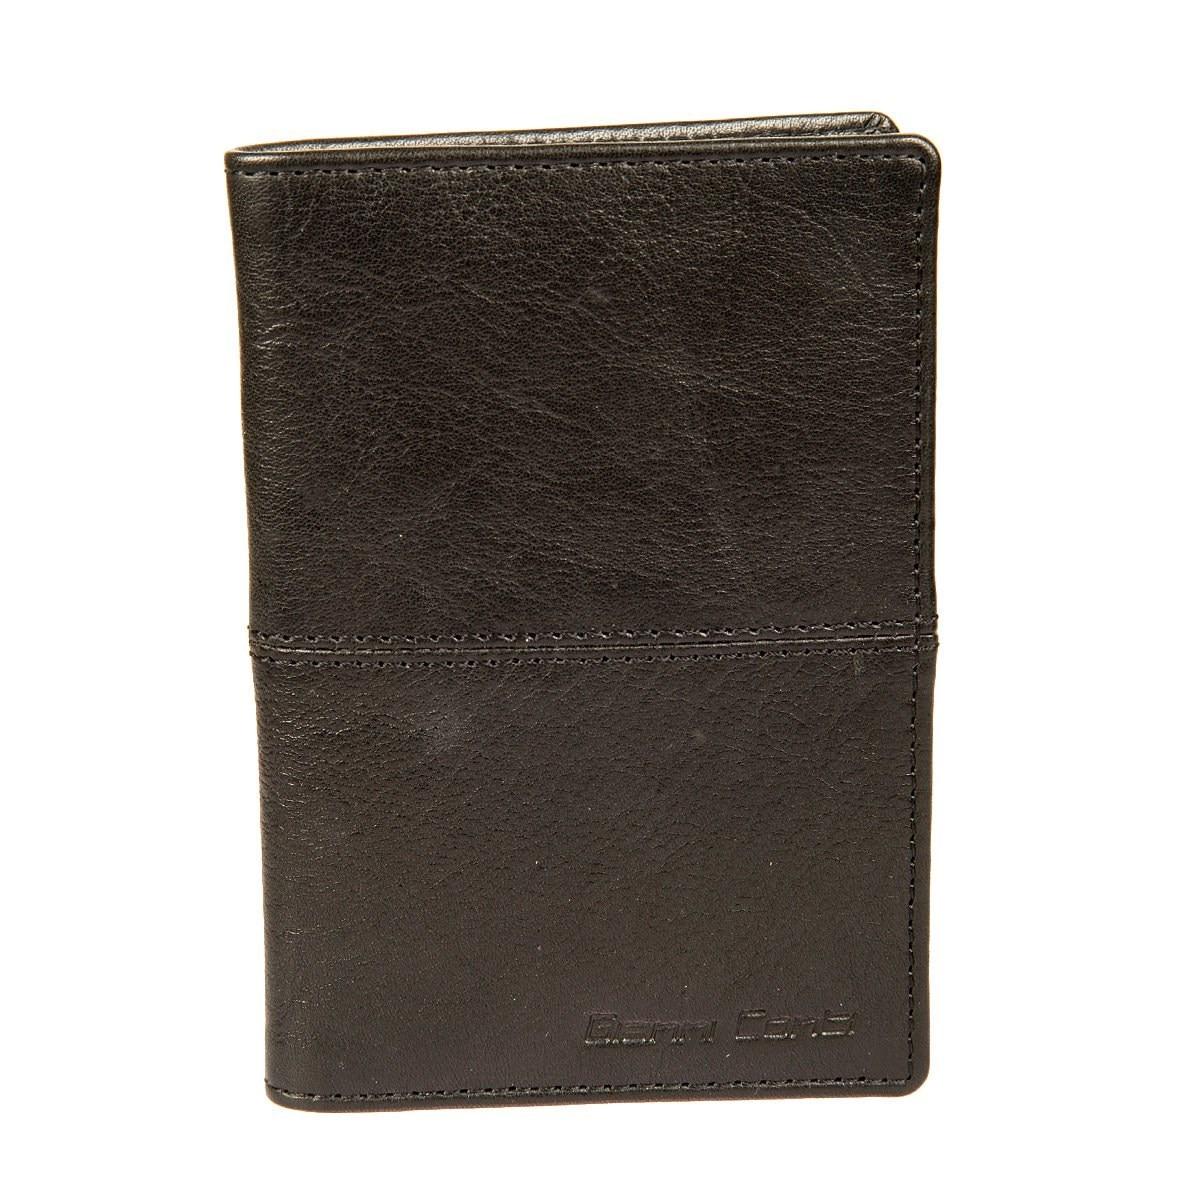 Cover for avtodokumentov Gianni Conti 1137463E black cover for avtodokumentov gianni conti 1227455 black